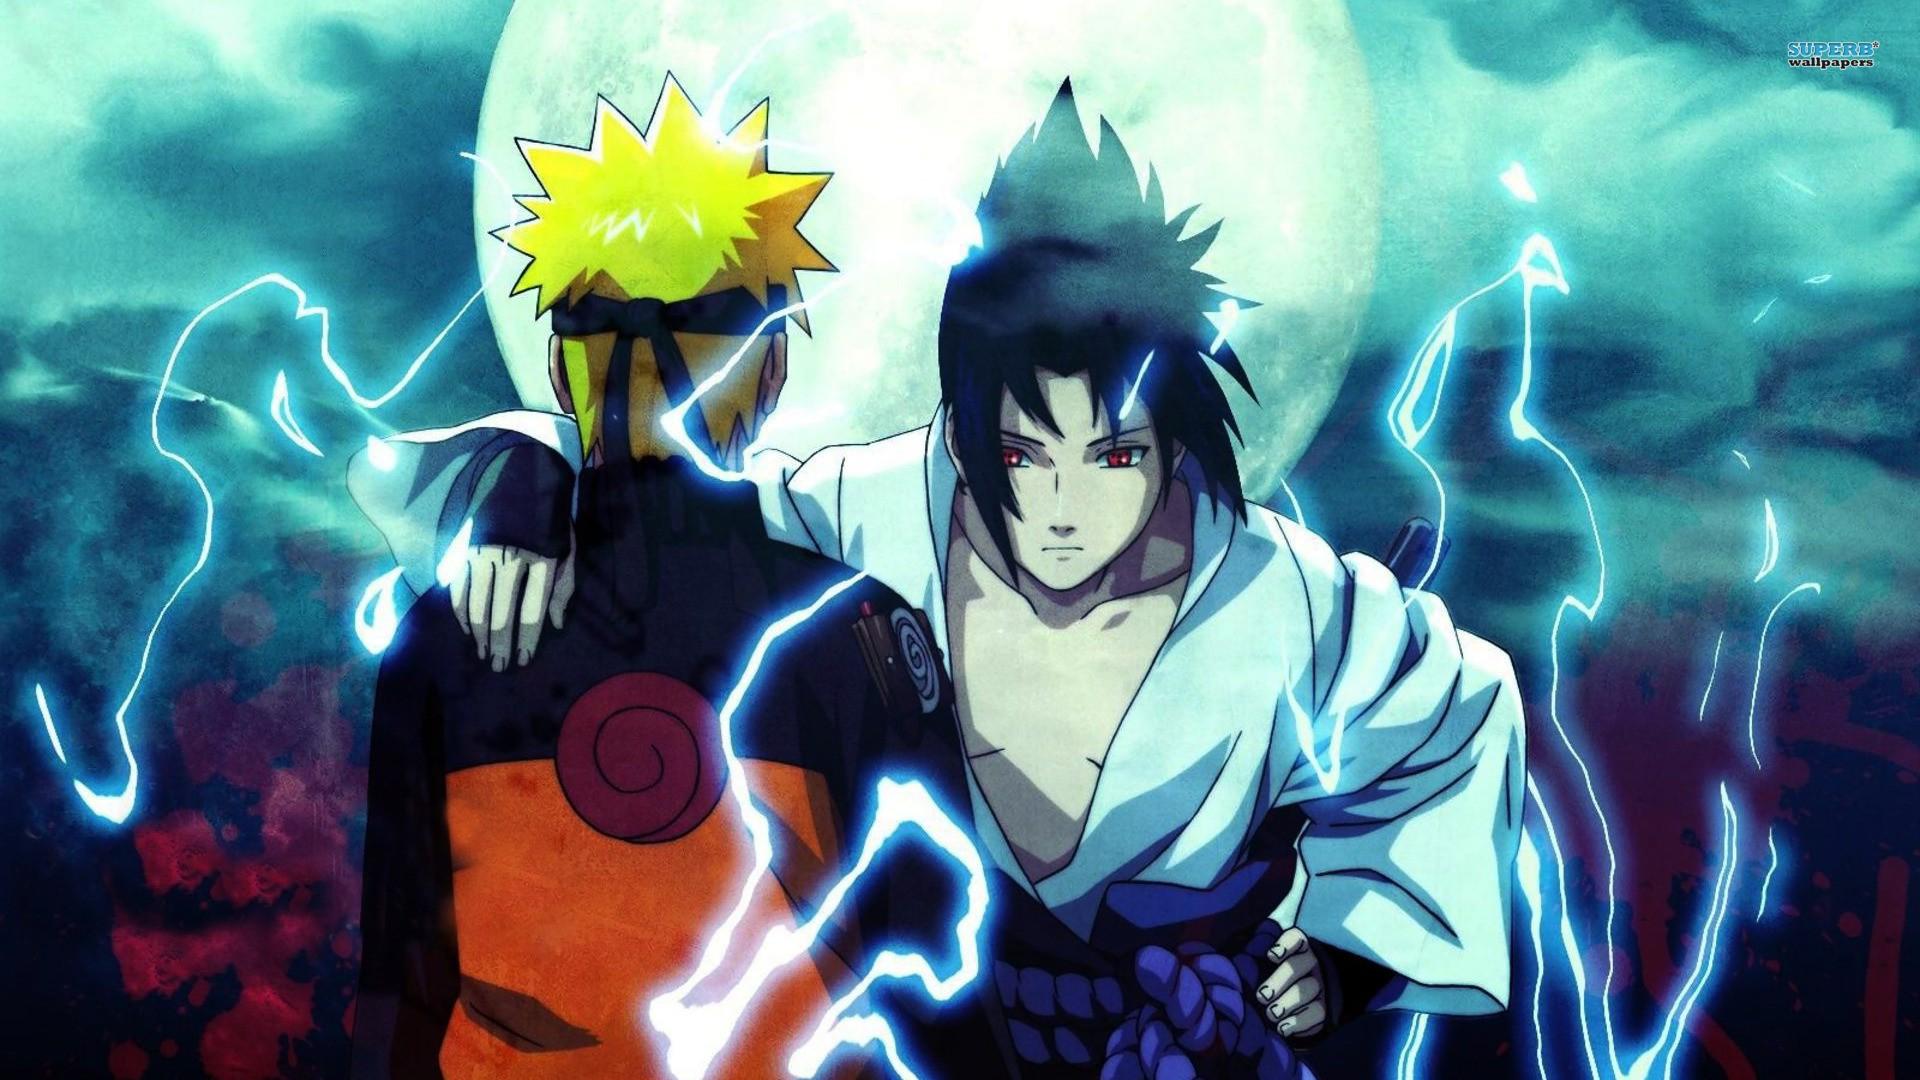 Free Download Naruto Sasuke Shippuden Pictures Hd Wallpaper Of